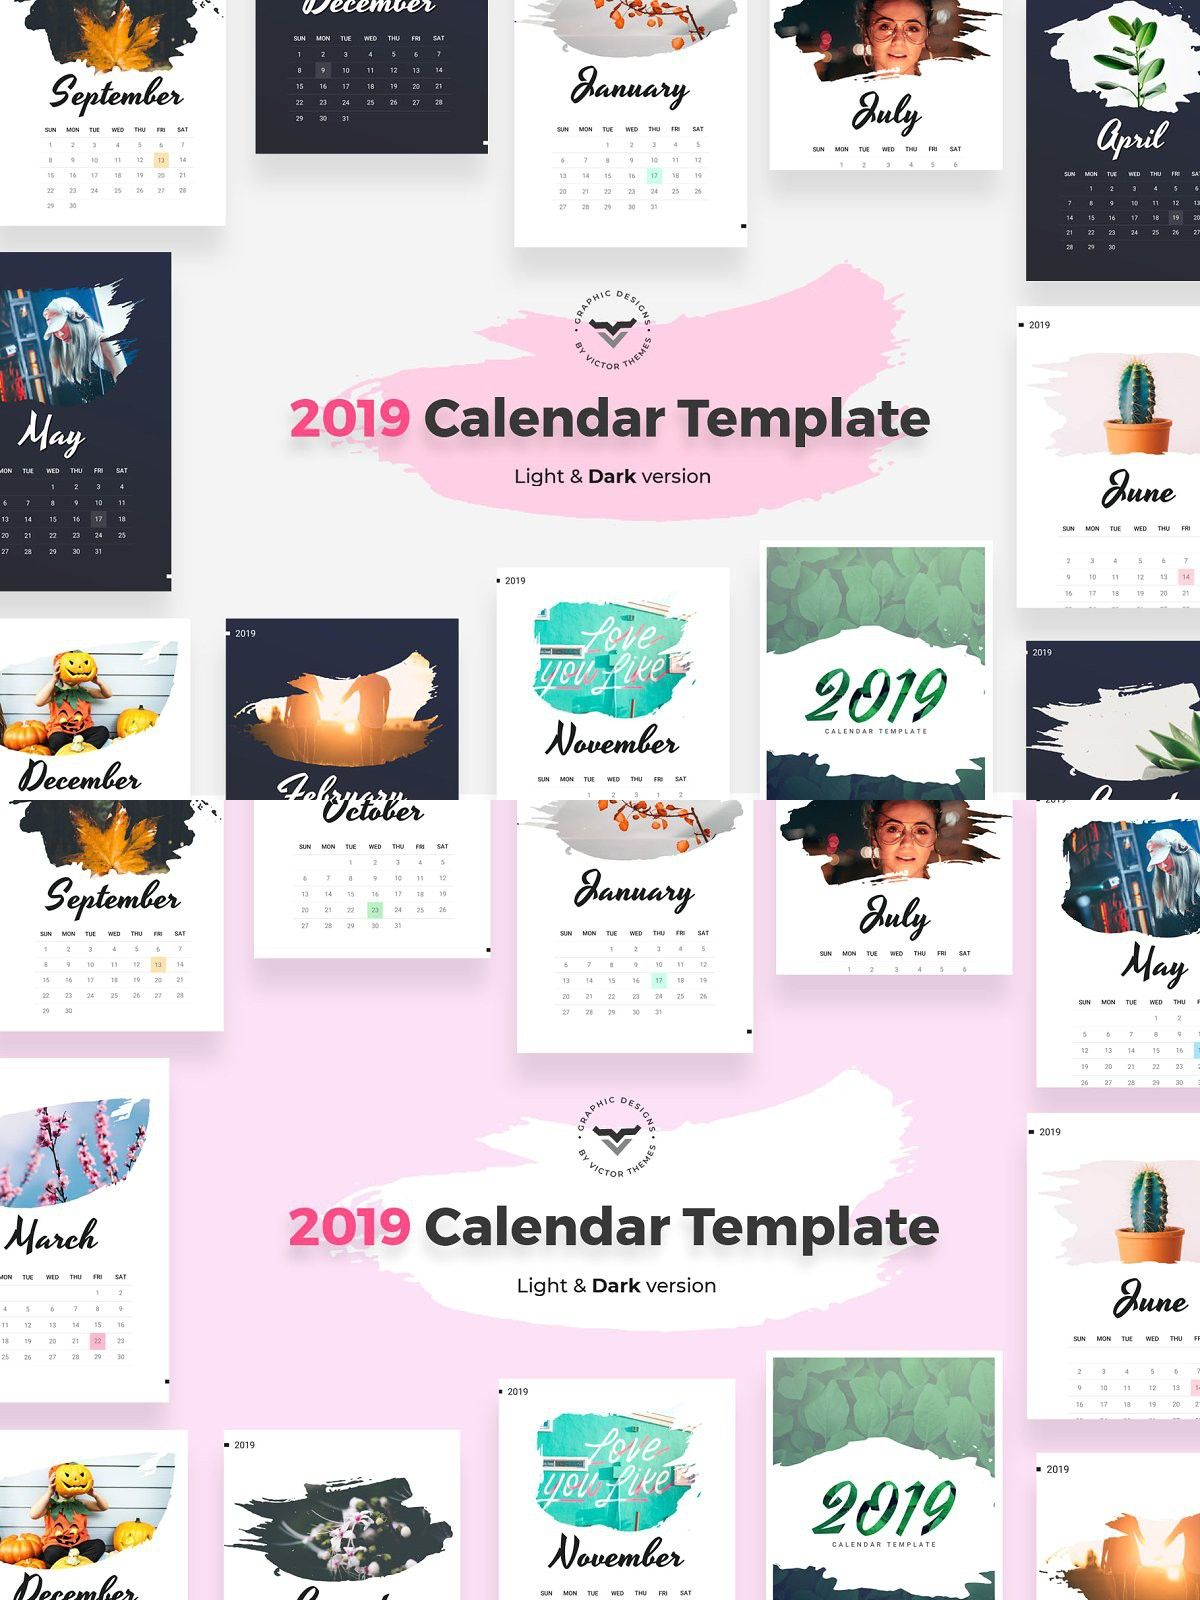 2019 Calendar Light & Dark Version (With images) Light